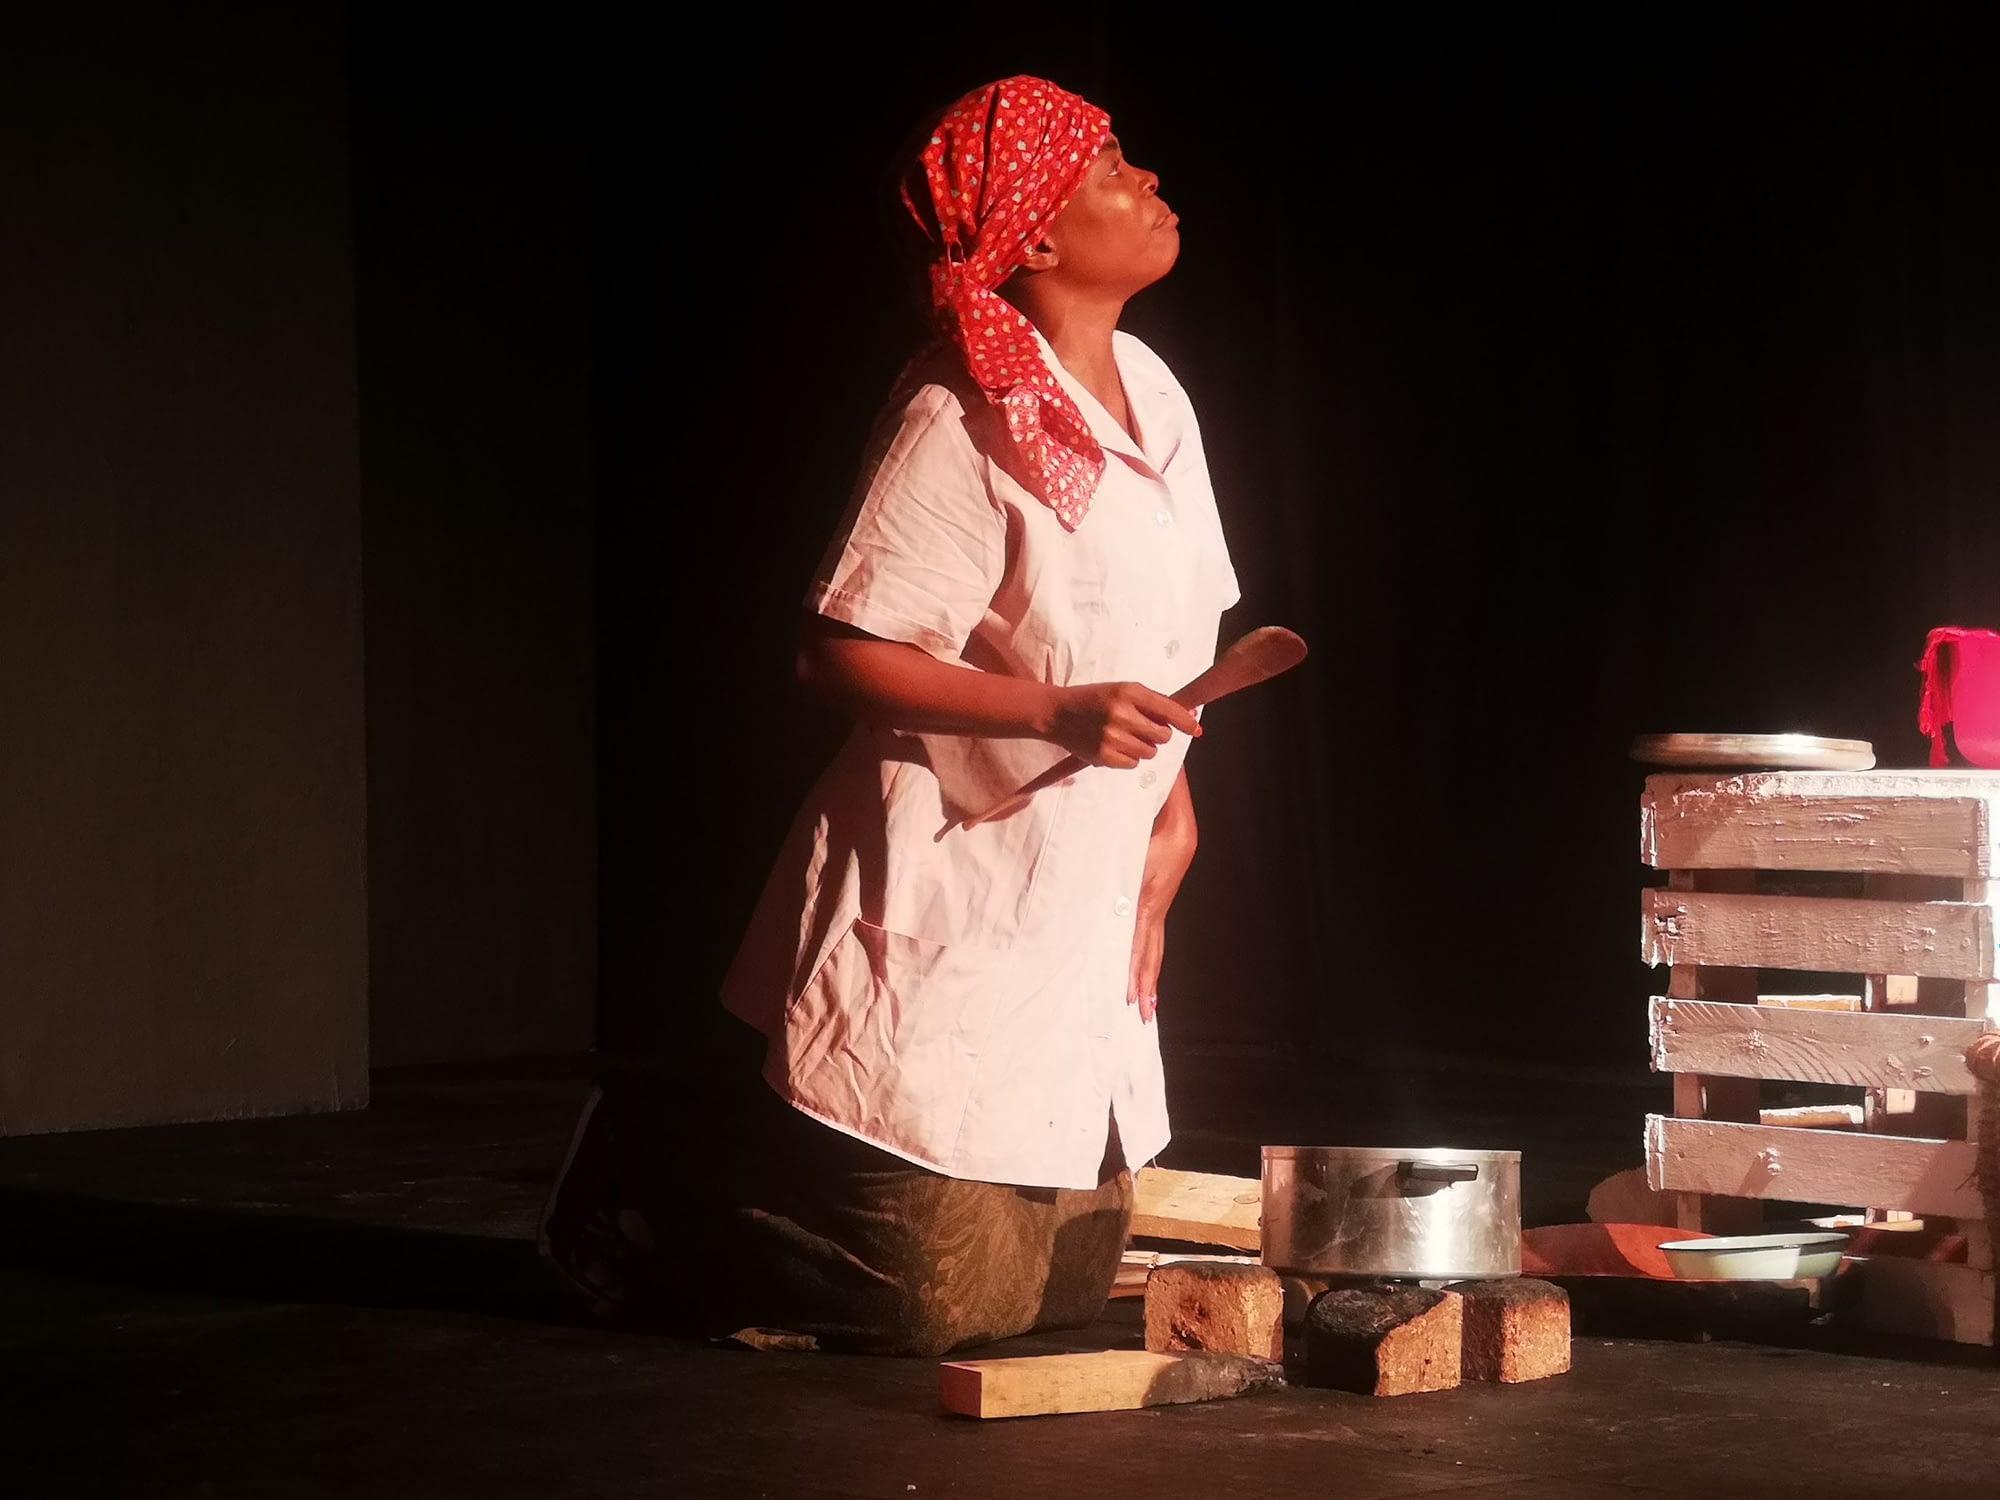 Lerumo written and directed by Malaika Ntsoeu at Kuwamba Women's Theatre Festival at the TX Theatre in Tembisa (Sthembiso Radebe and Thokozani Maseko)